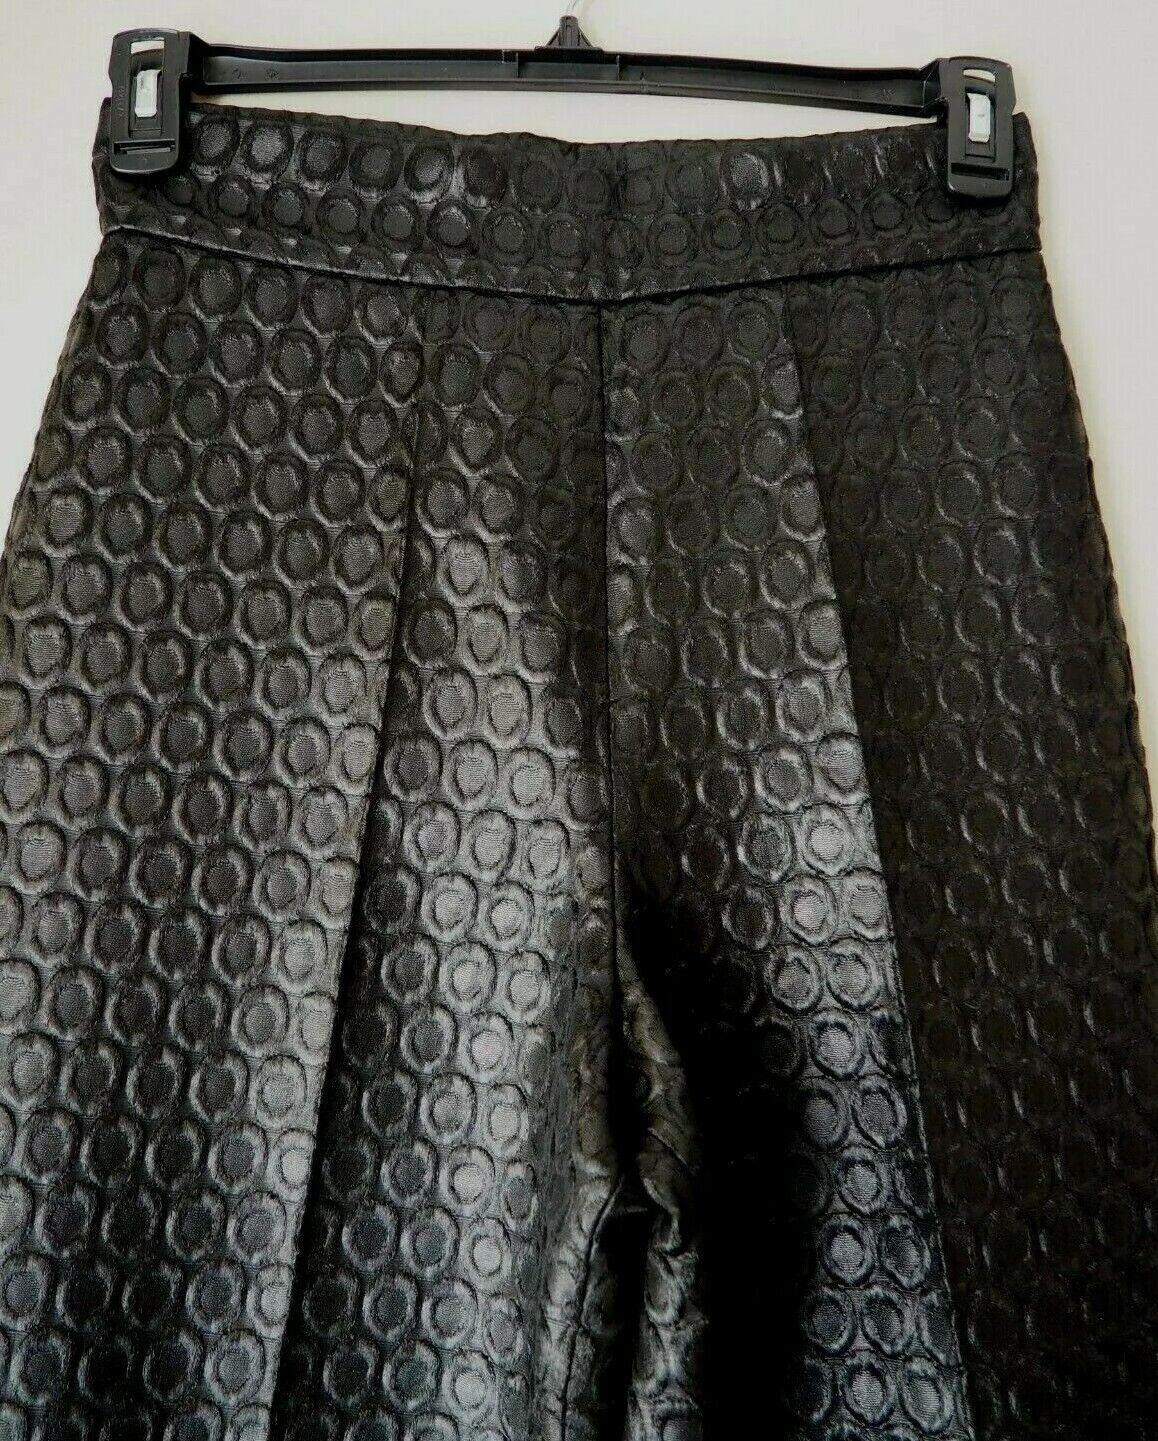 PRADA 1990's Vintage Pants Trousers Circular Desi… - image 5